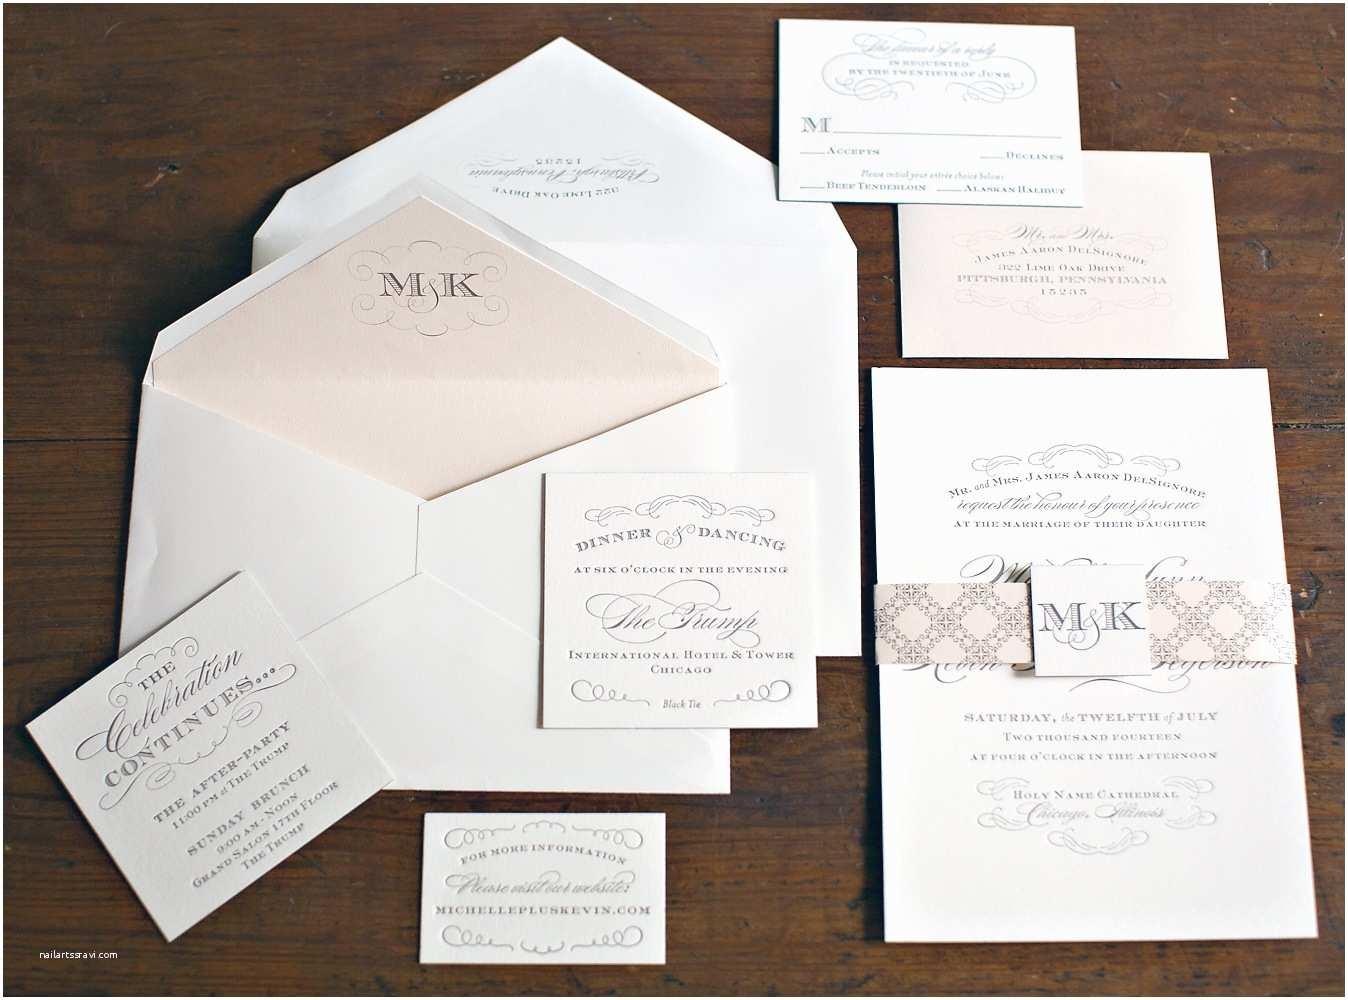 Chicago Wedding Invitations Nico and Lala Chicago Trump Hotel Wedding